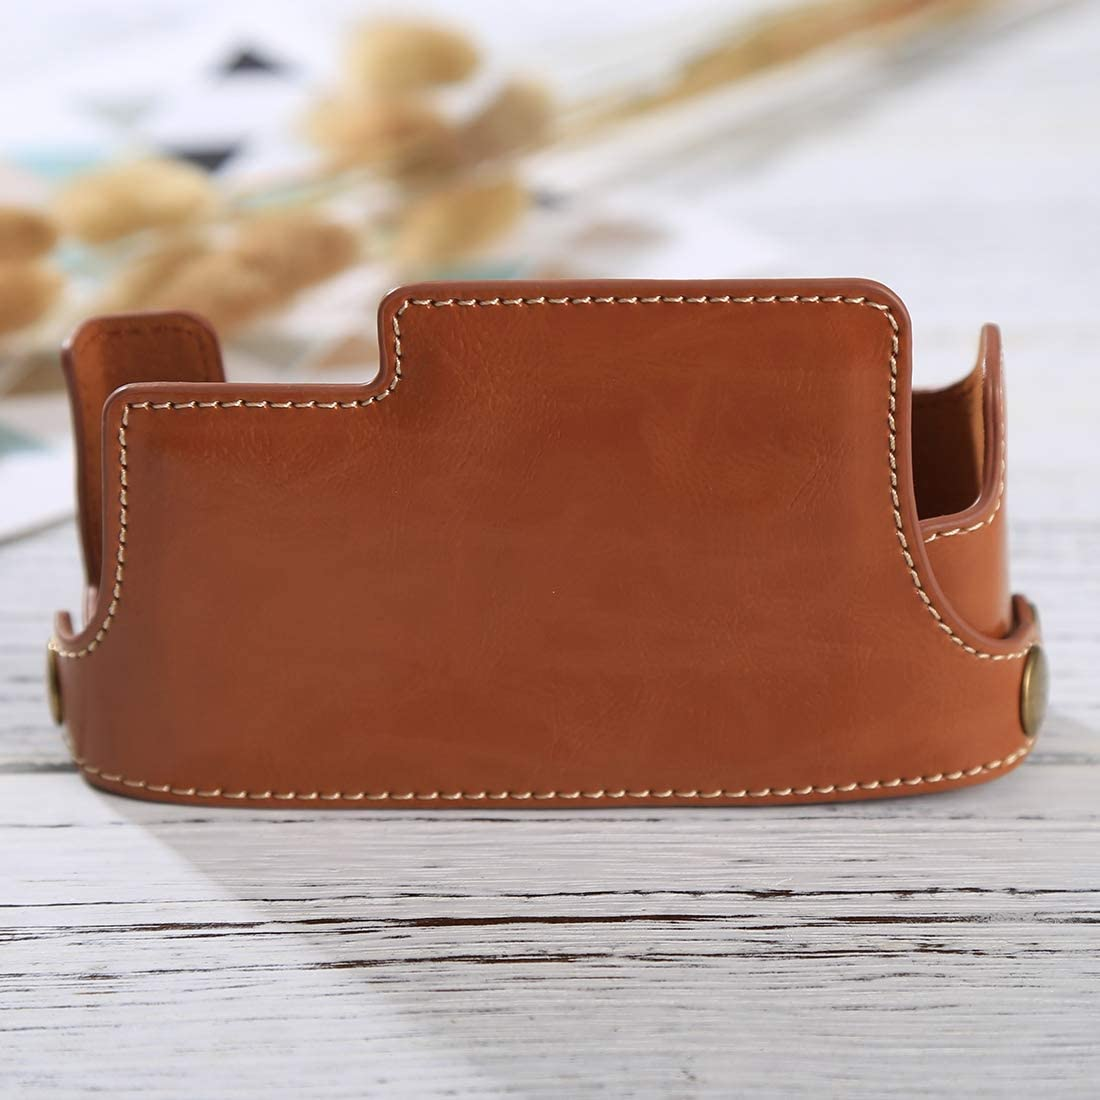 Color : Brown 1//4 inch Thread PU Leather Camera Half Case Base for FUJIFILM X-E3 Reliable